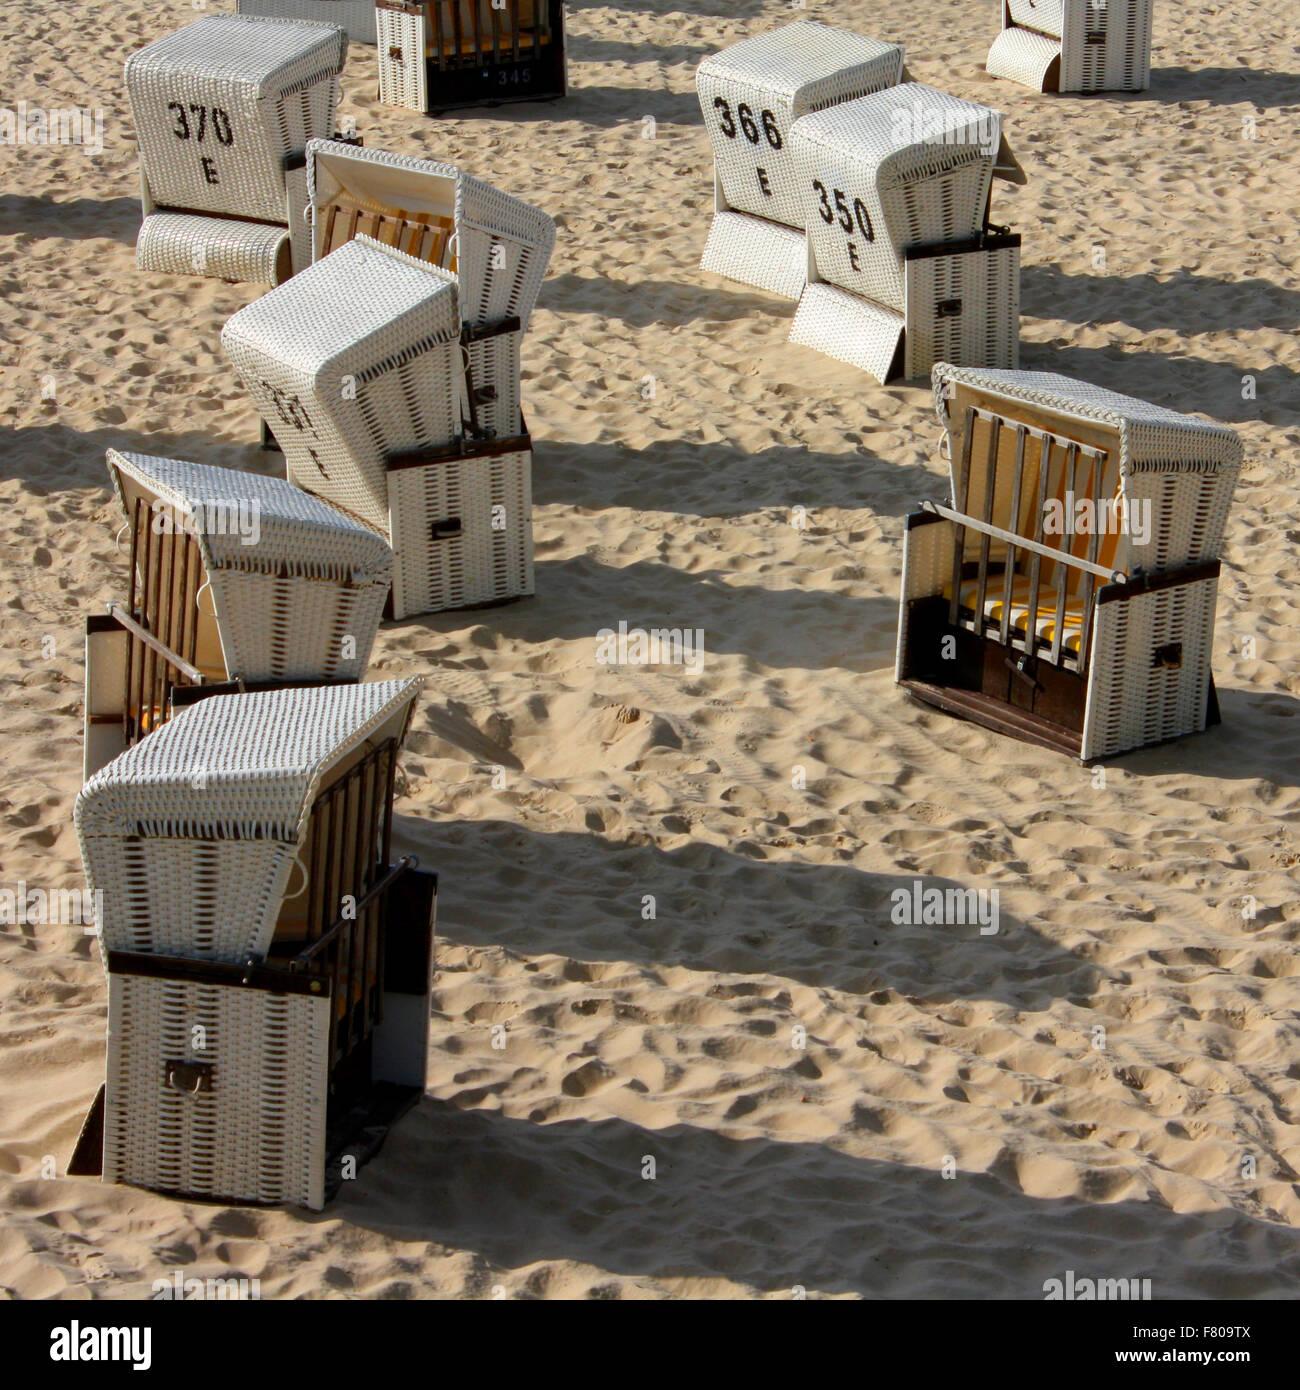 Kolonie Strandkörbe - Stock Image